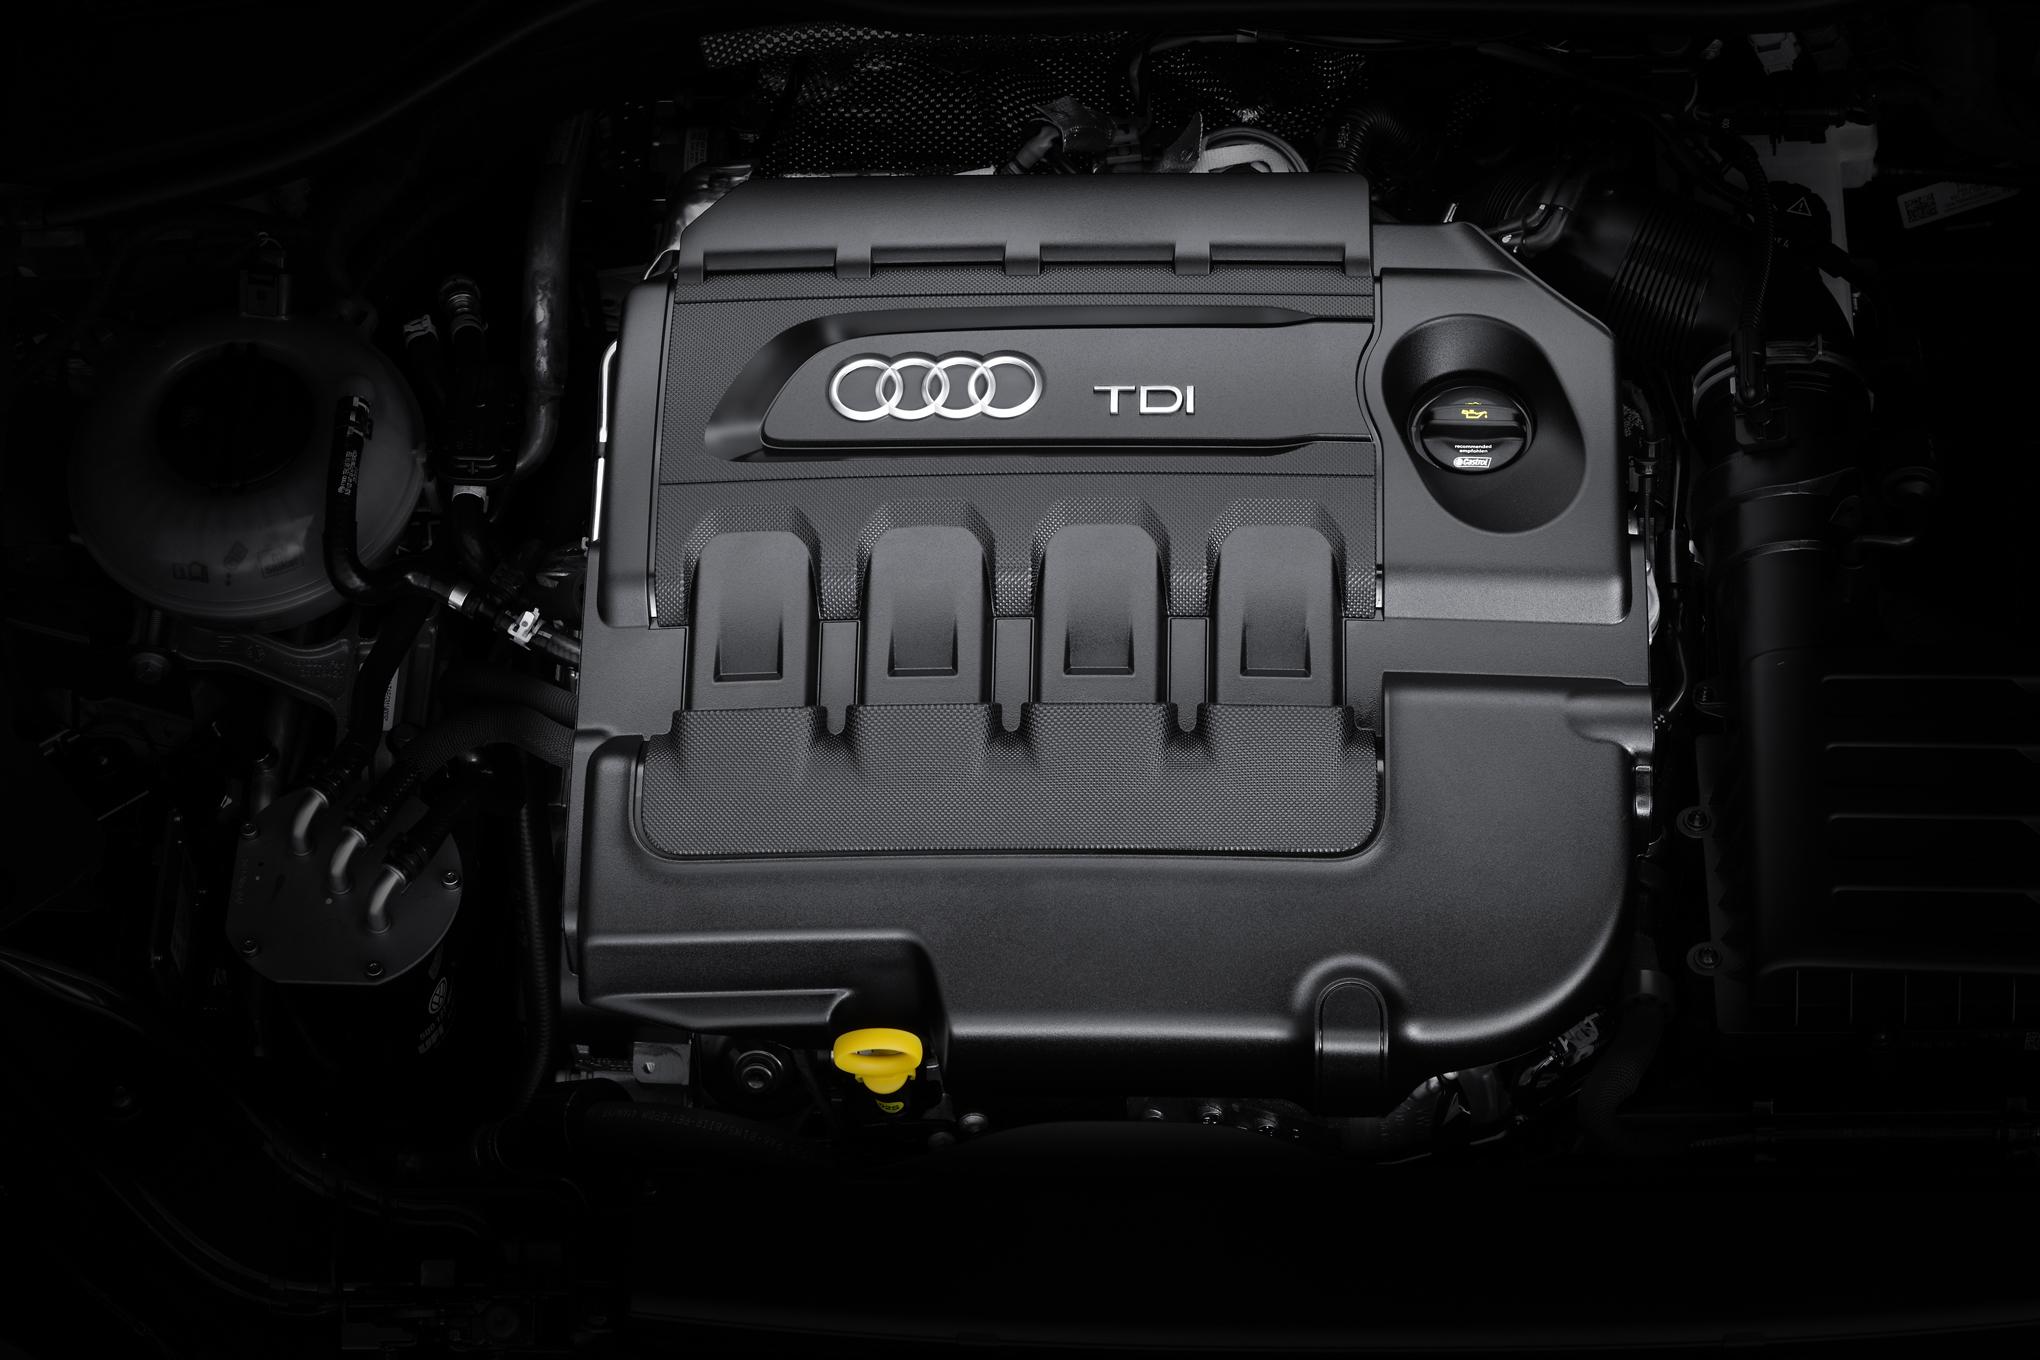 2016 Audi TT Engine View